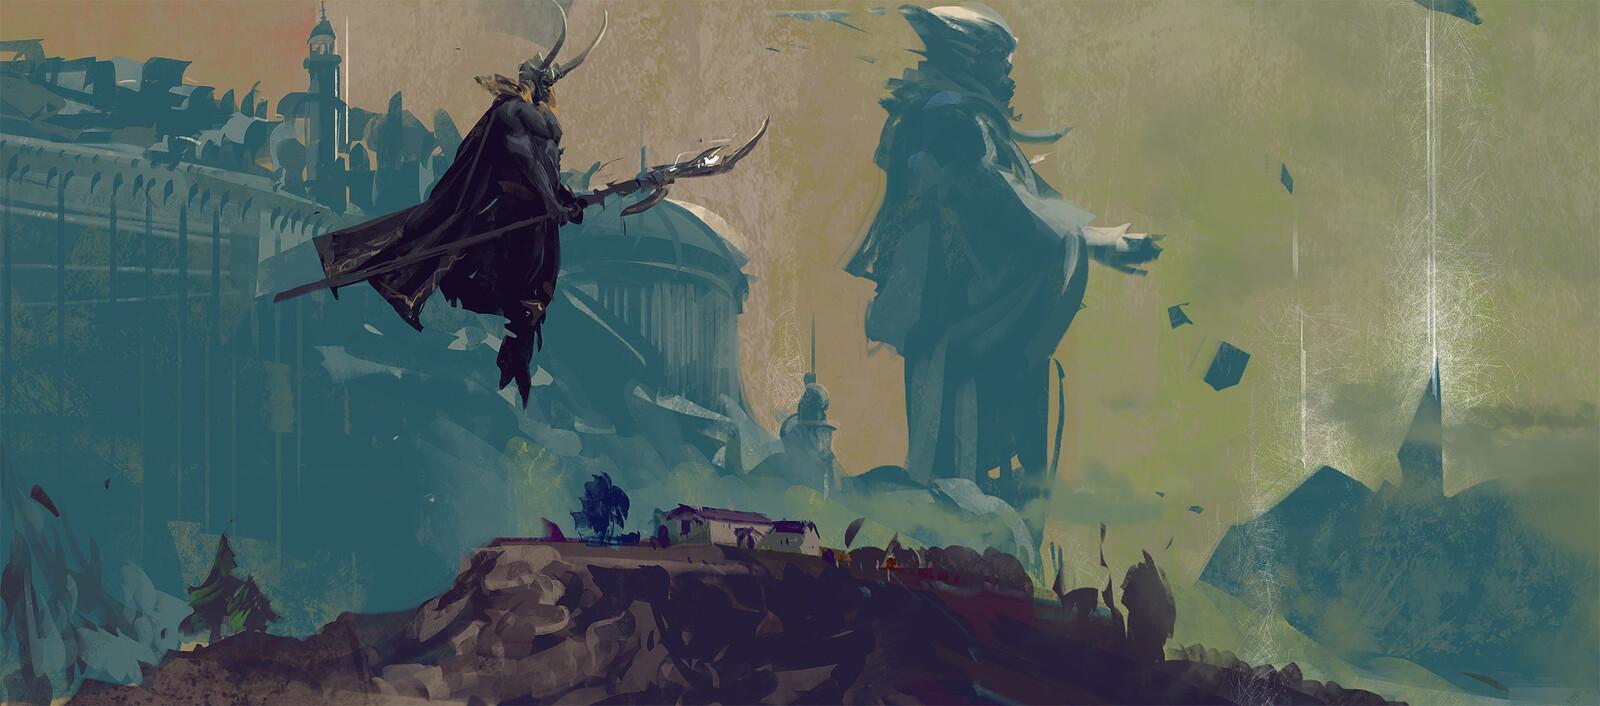 Loki's retirement